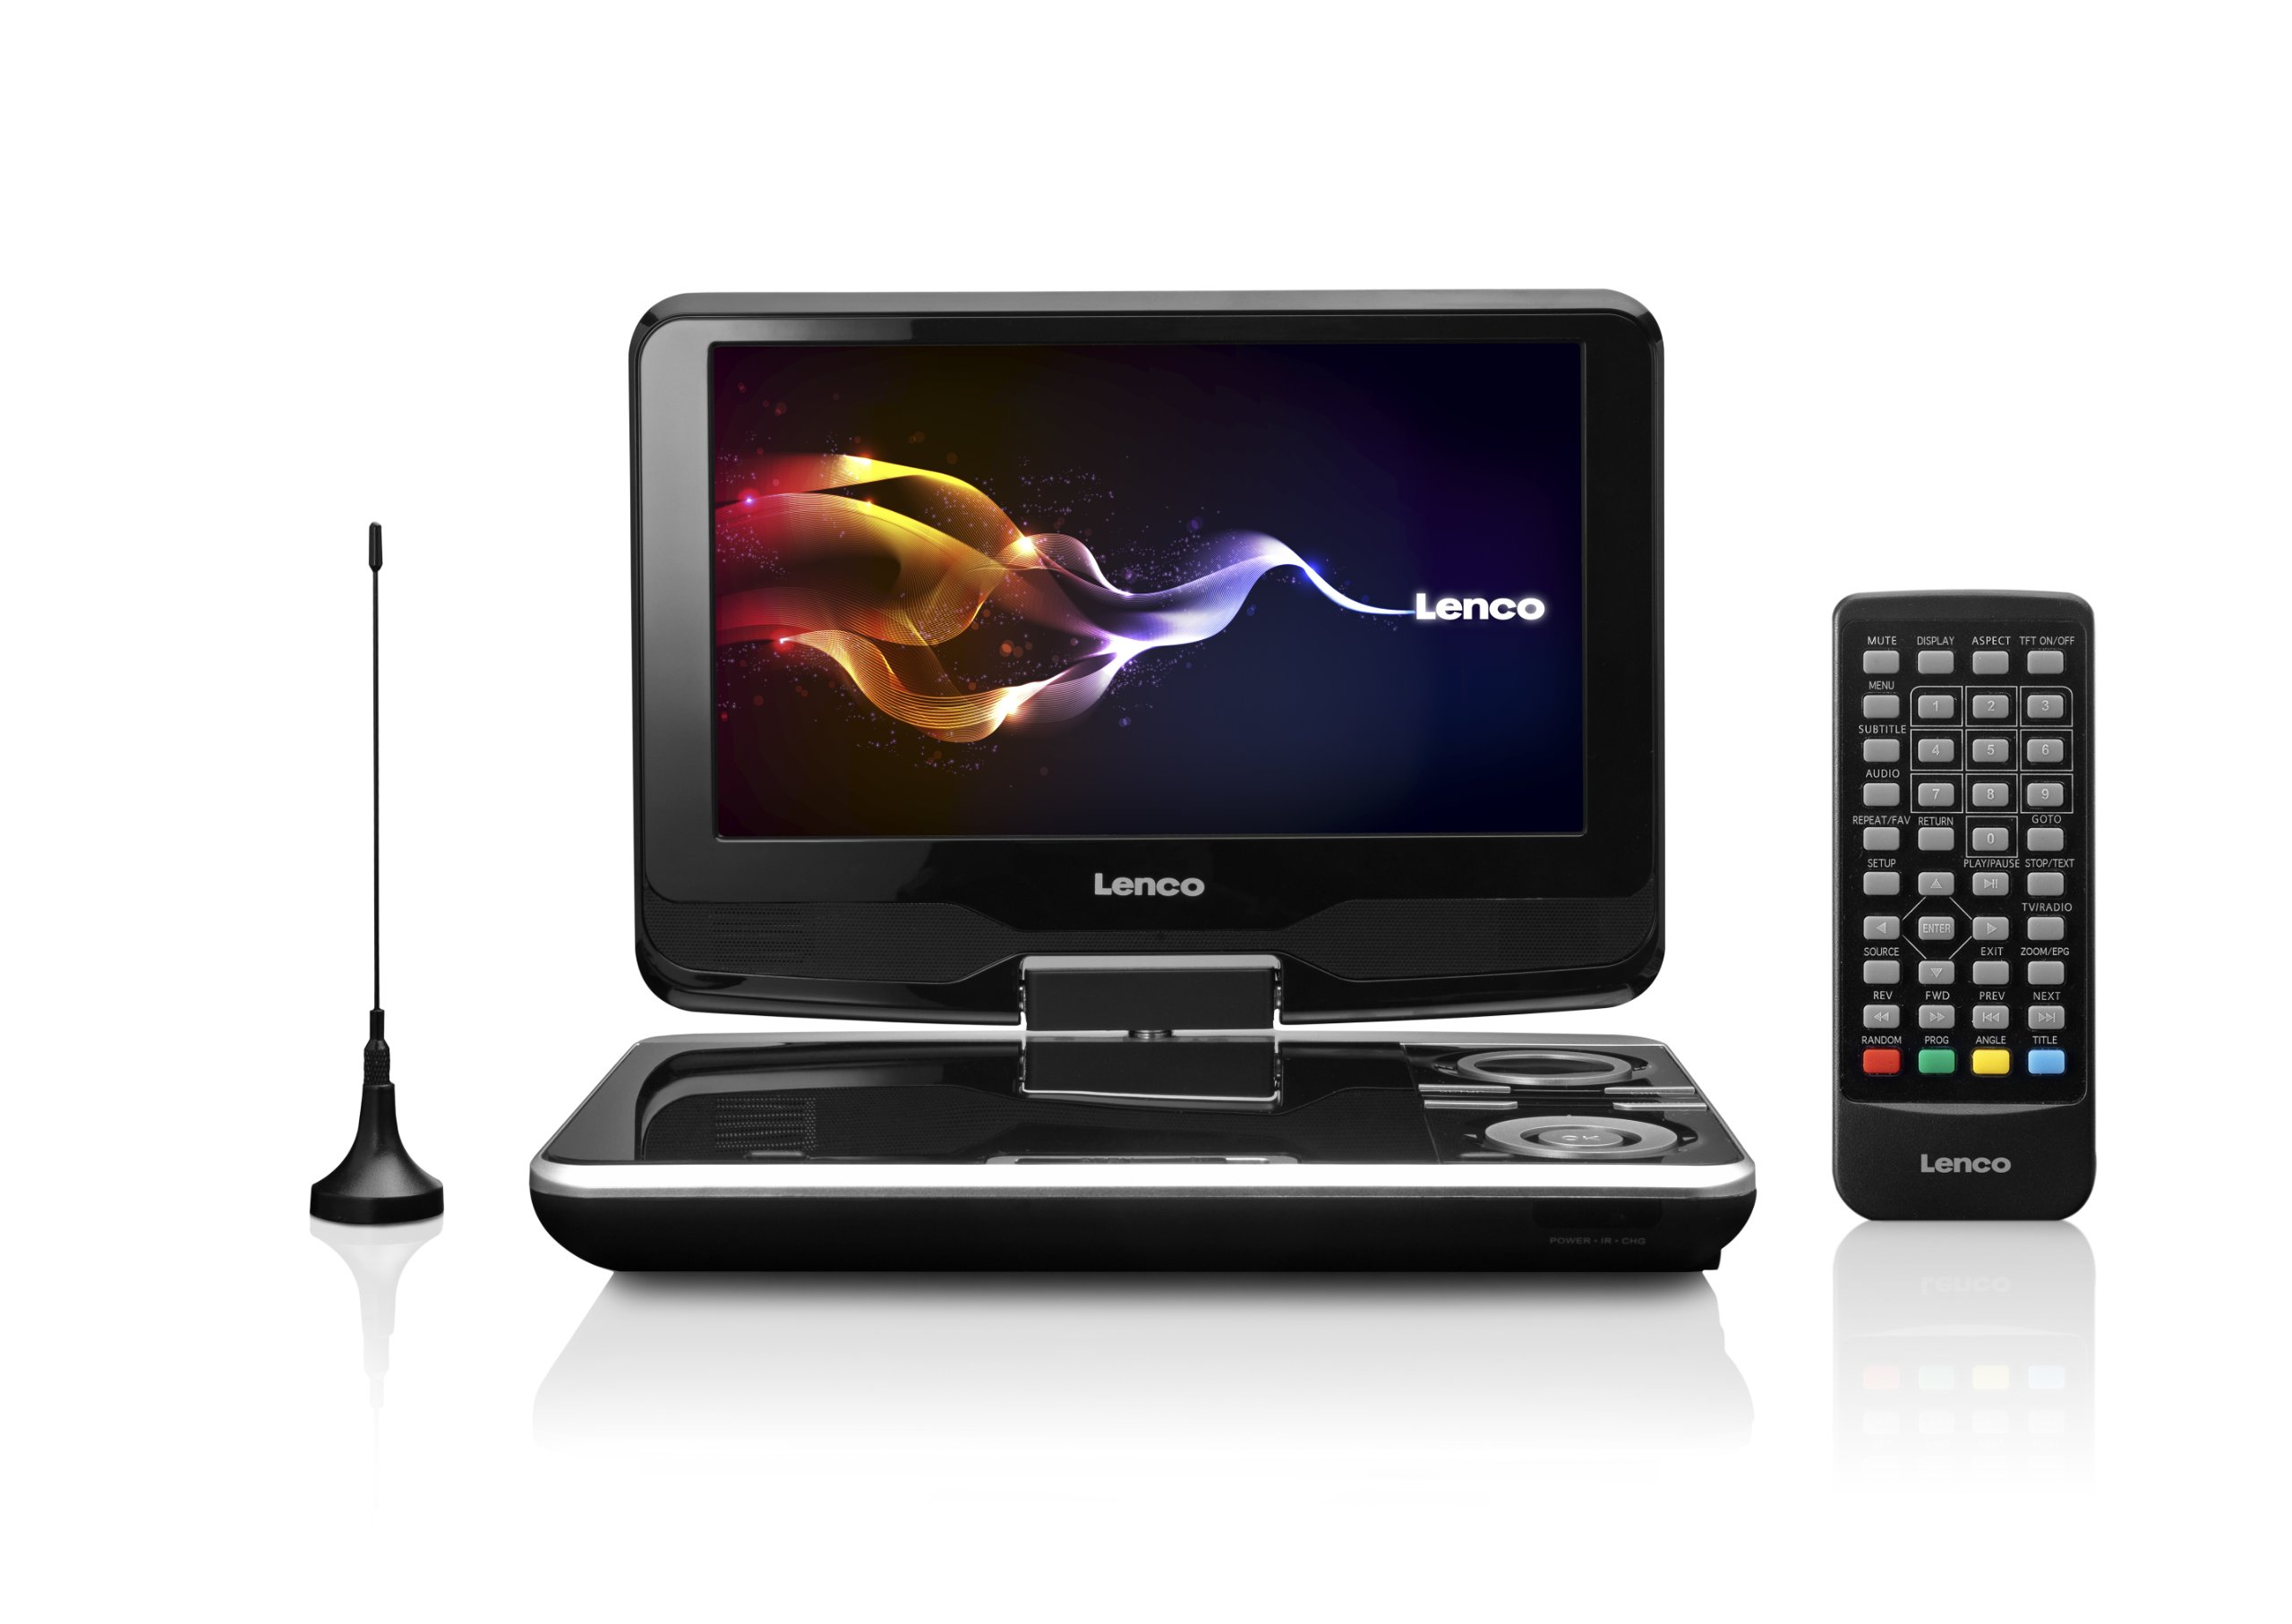 Lenco DVP-9411 - Reproductor de DVD portátil (pantalla de 9/22,9 cm, radio DVB-T, USB) (importado): Lenco: Amazon.es: Electrónica